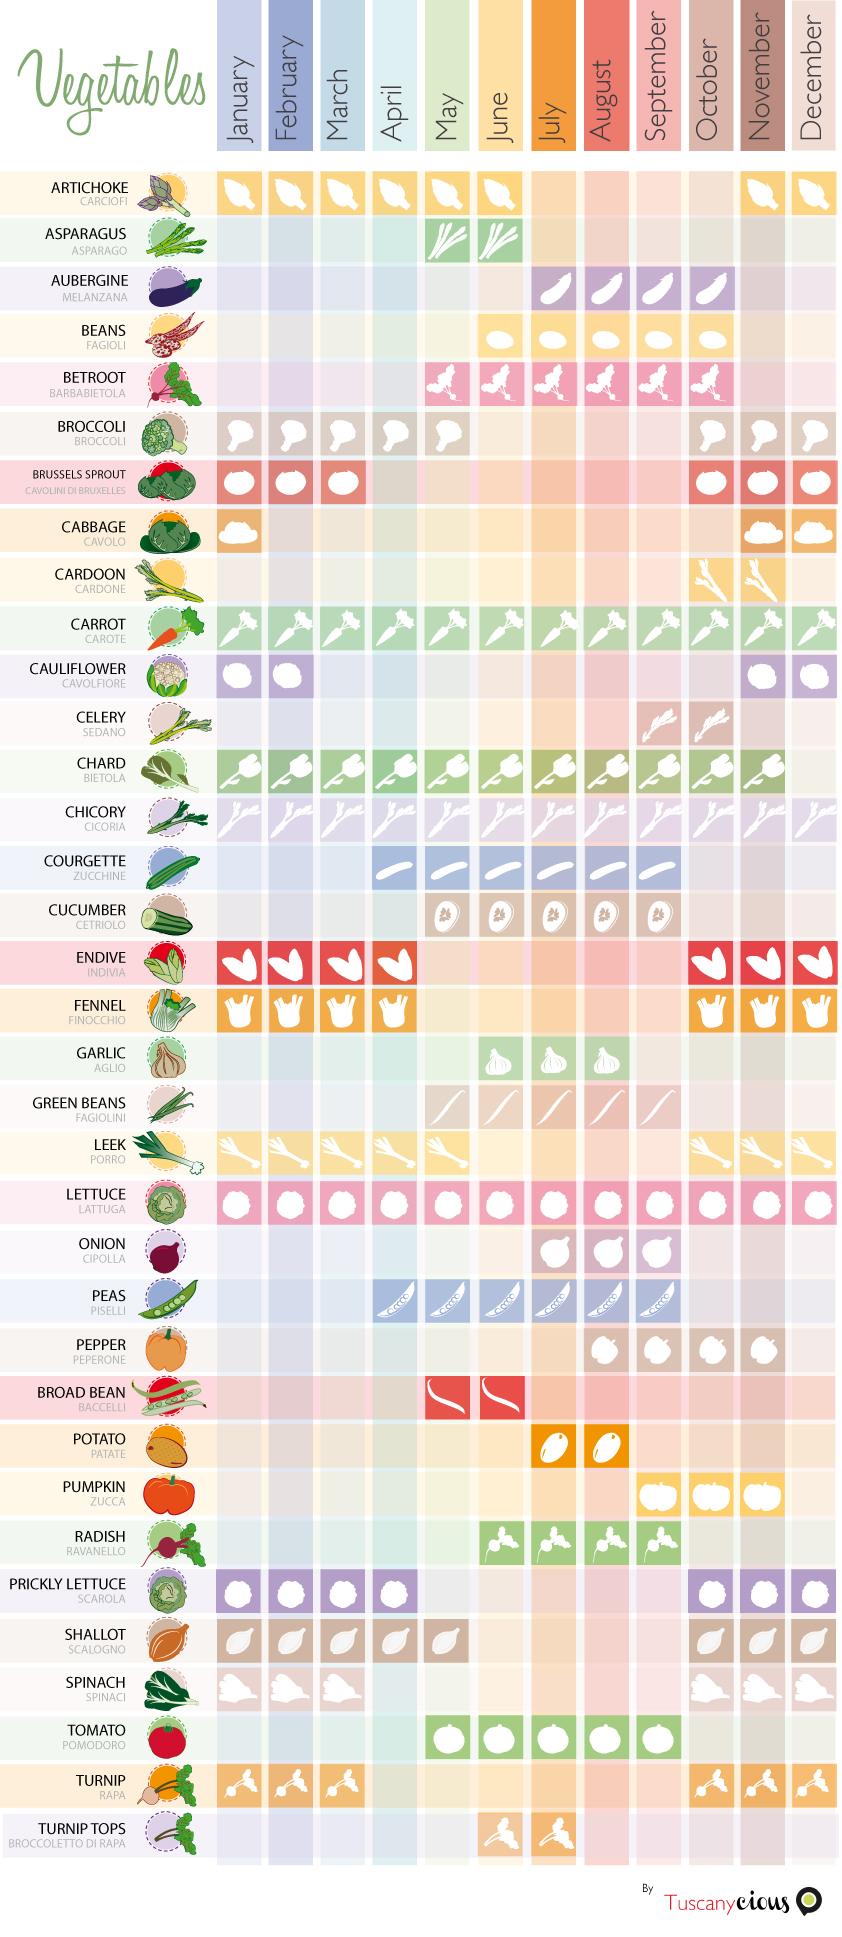 vegetables-per-pubblicazione